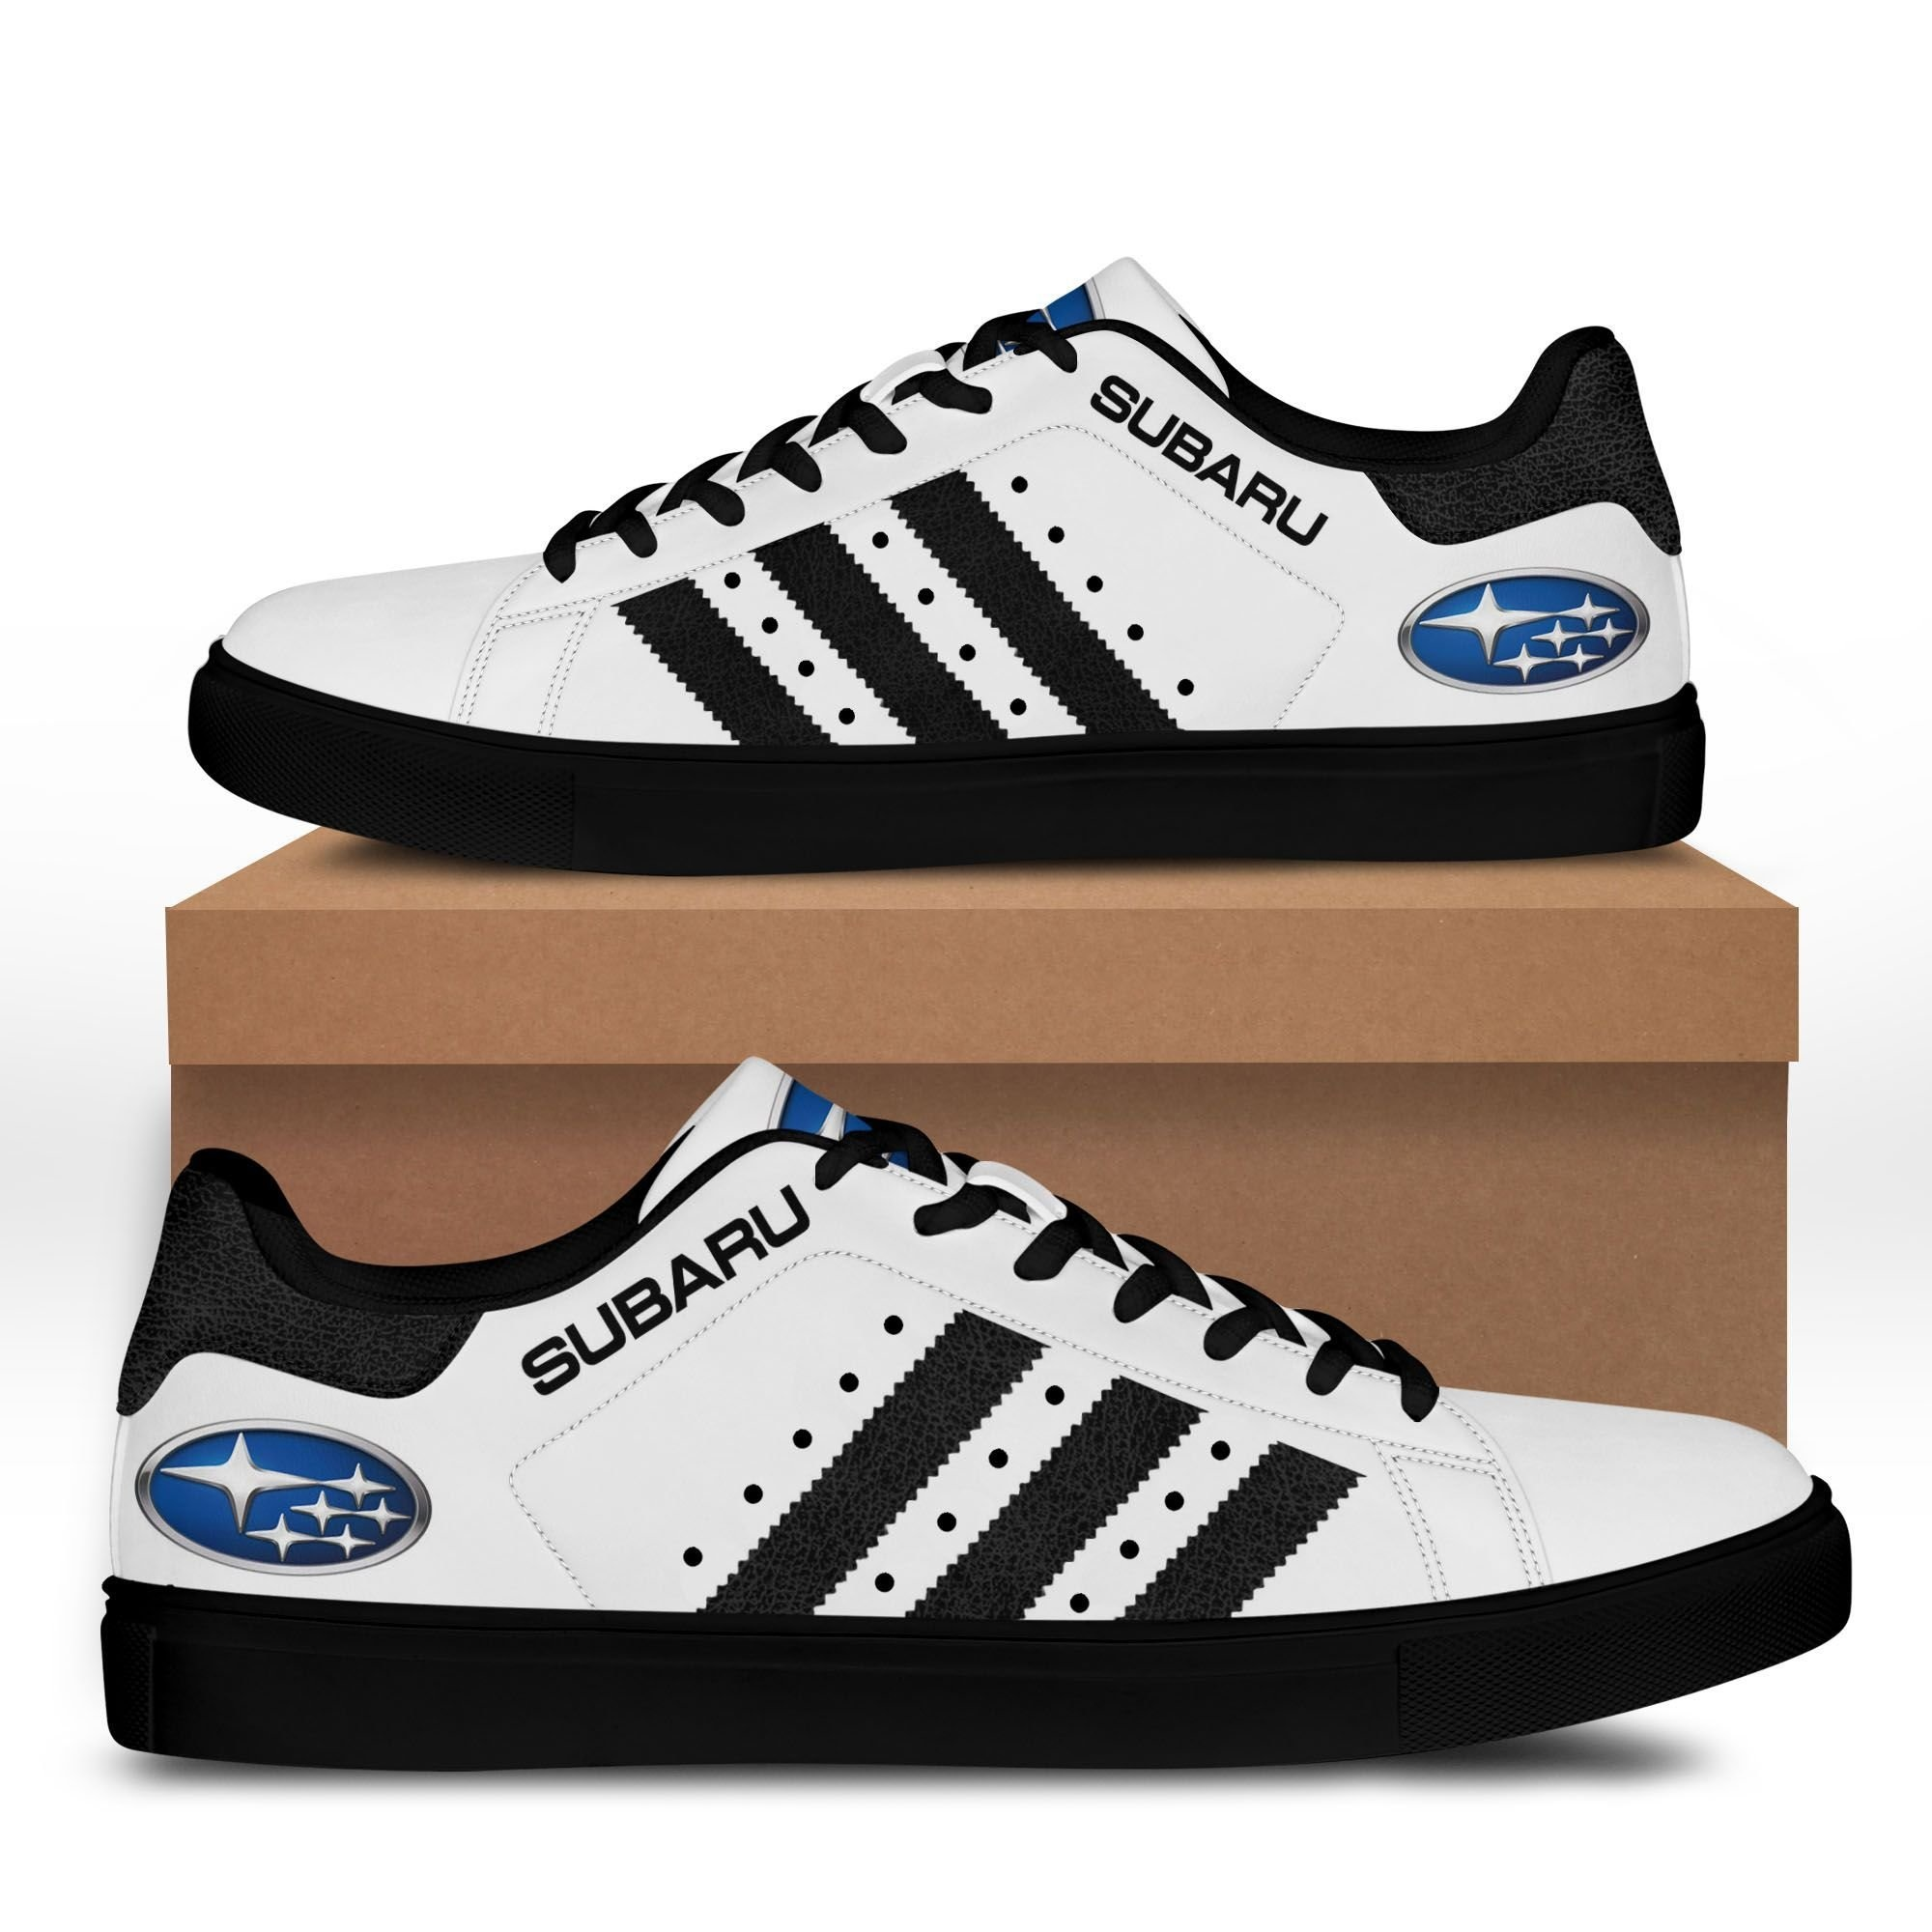 Subaru stan smith shoes - Picture 2